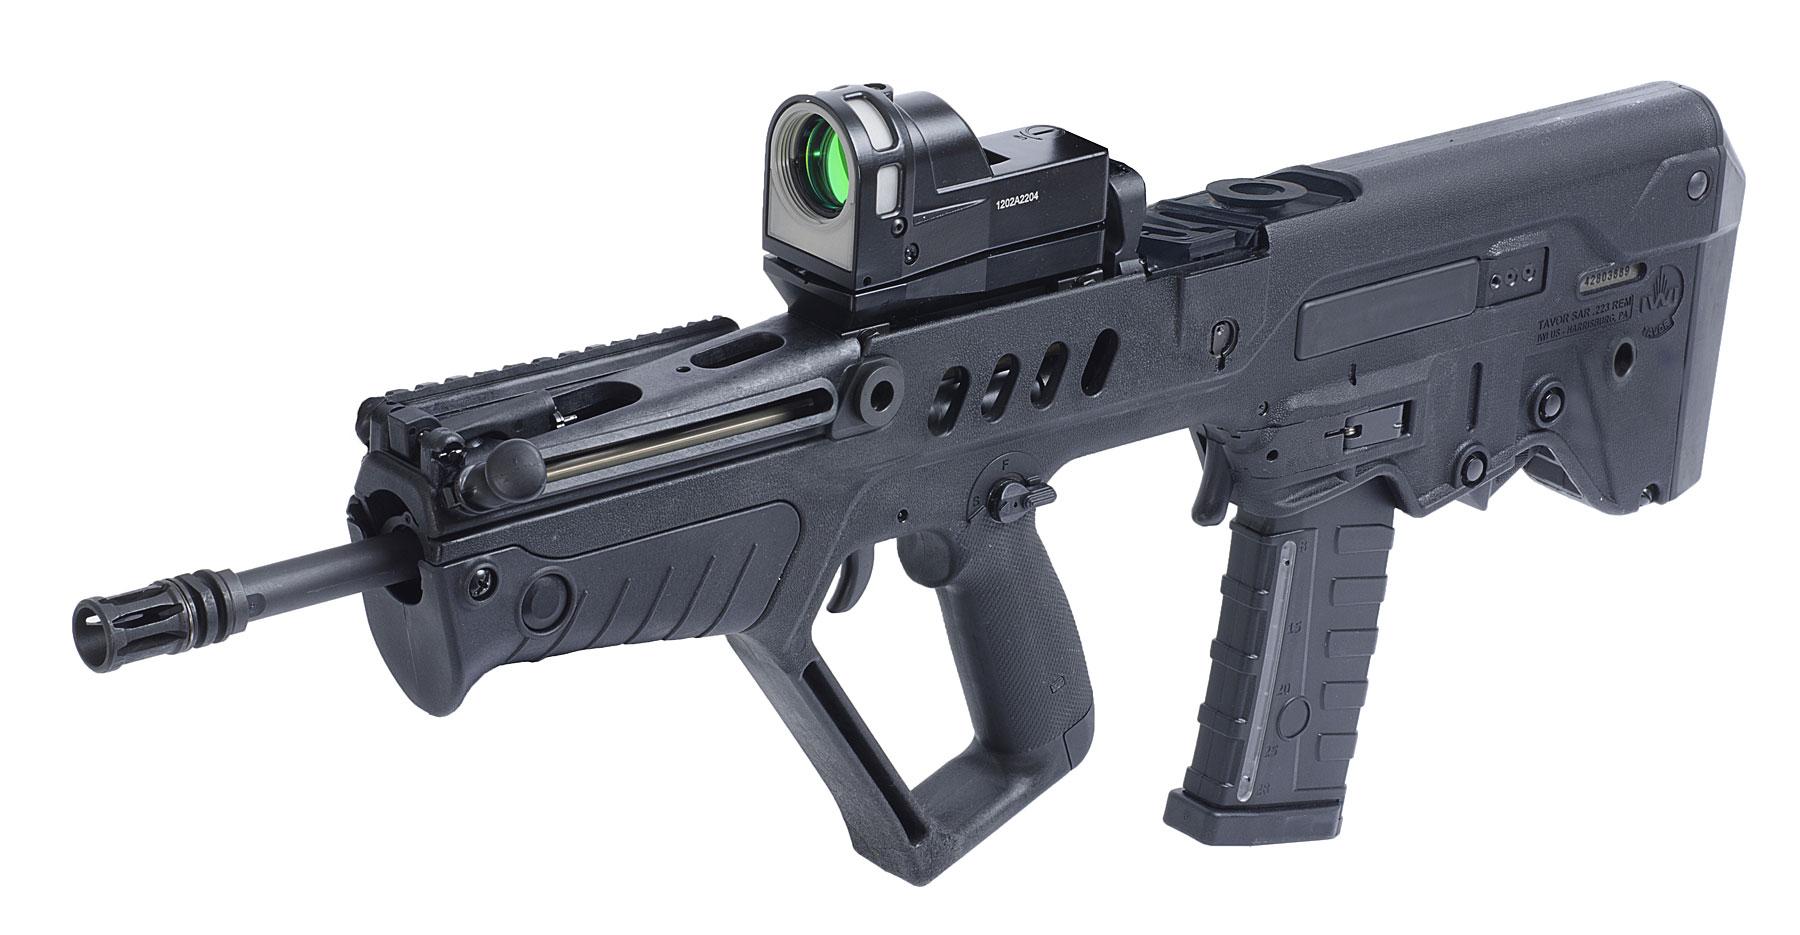 assult rifles Image name mode attachments magazine size damage range (head) damage range (body) damage range (limbs) m4a1 single& auto 5 30 46-102 18-41 20 ar15 single& auto 4 30 46-102 18-41 20 akm single&amp auto 3 30 67-148 25-55 27 m14ebr single&amp 3-round burst 3 30 46-102 18-41 20 file:an-94png an-94.